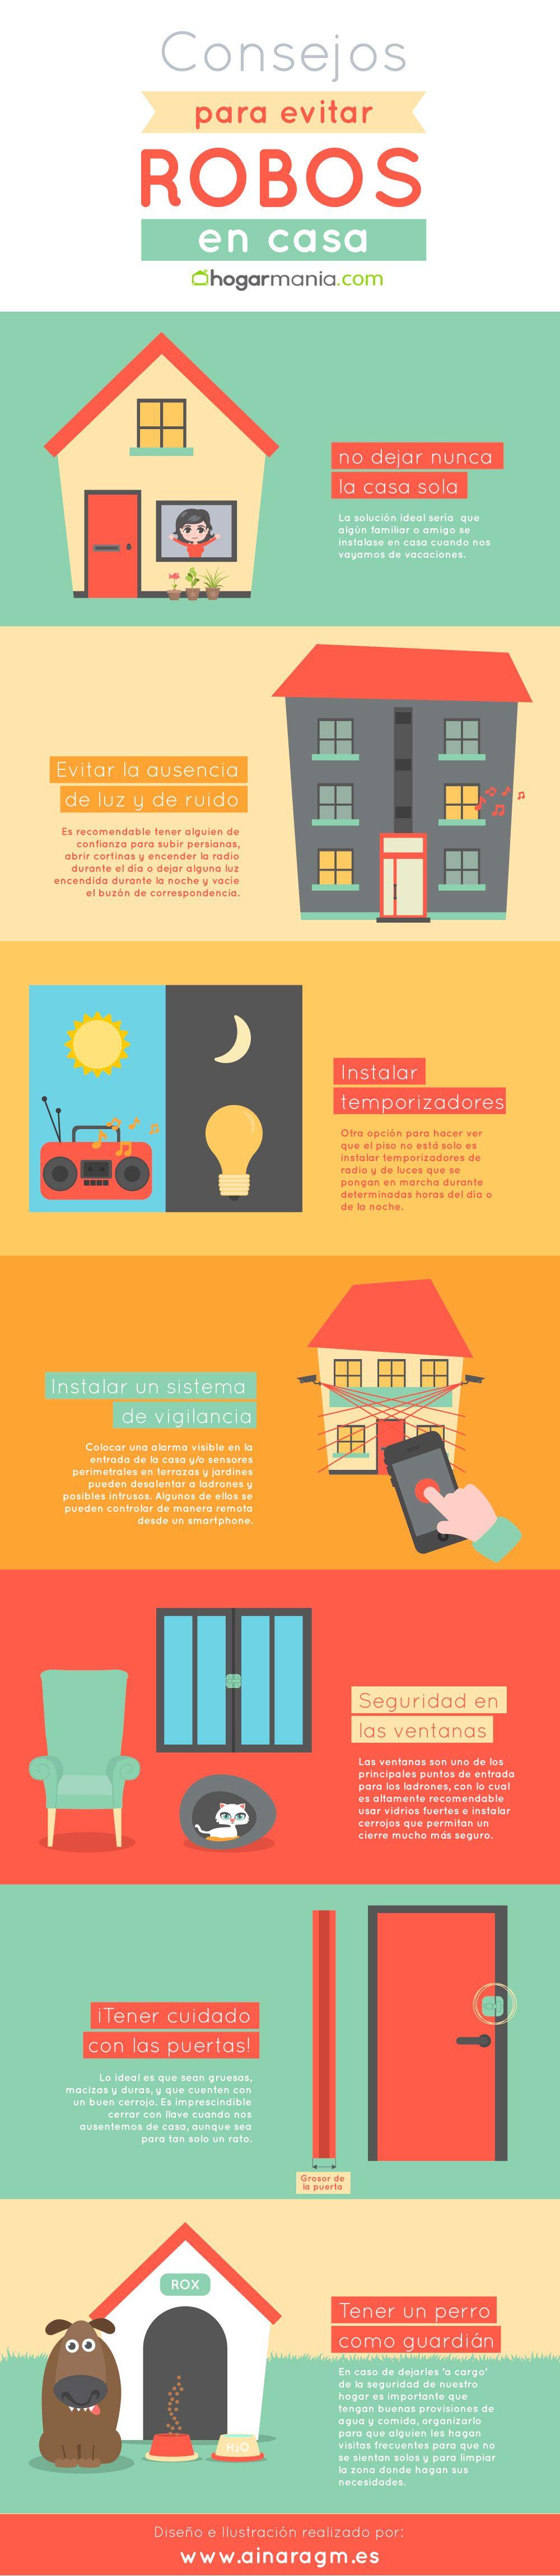 infografia evitar robos casa vacaciones